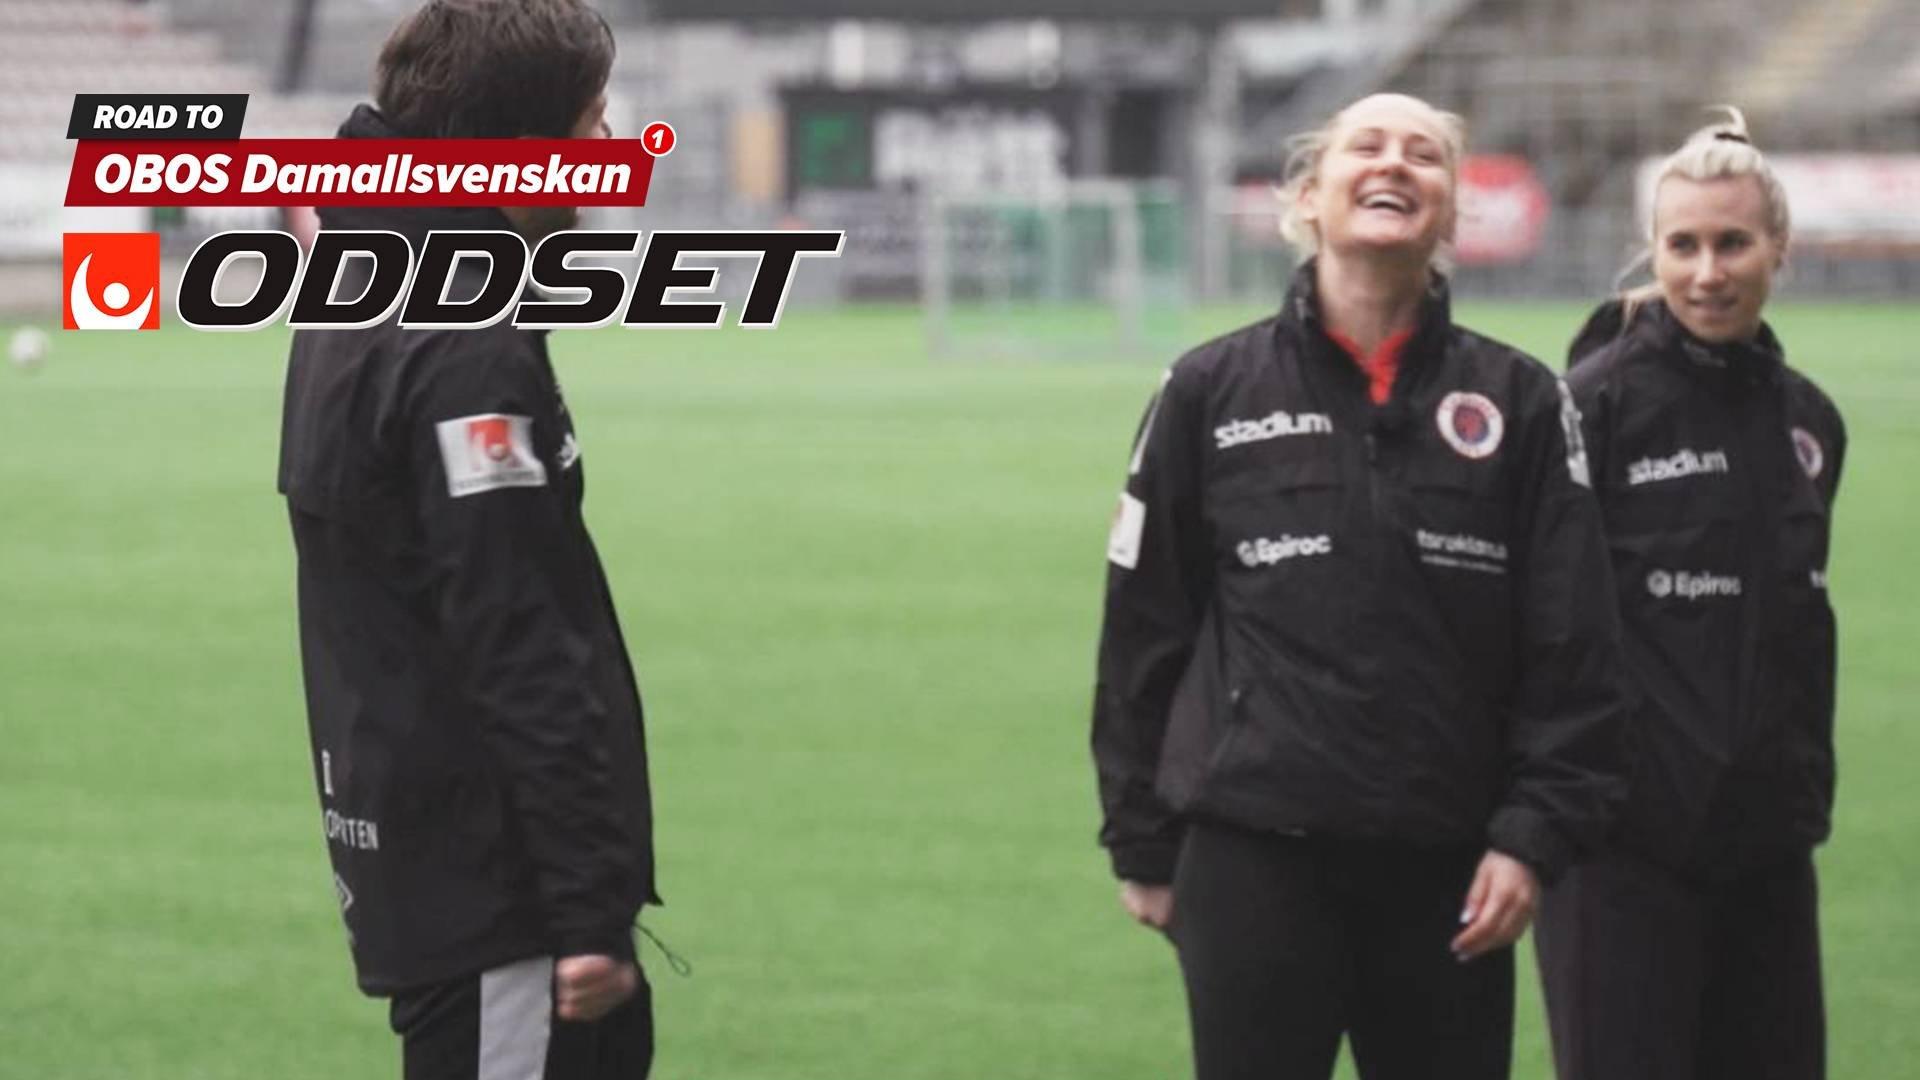 Road to OBOS Damallsvenskan - KIF Örebro DFF